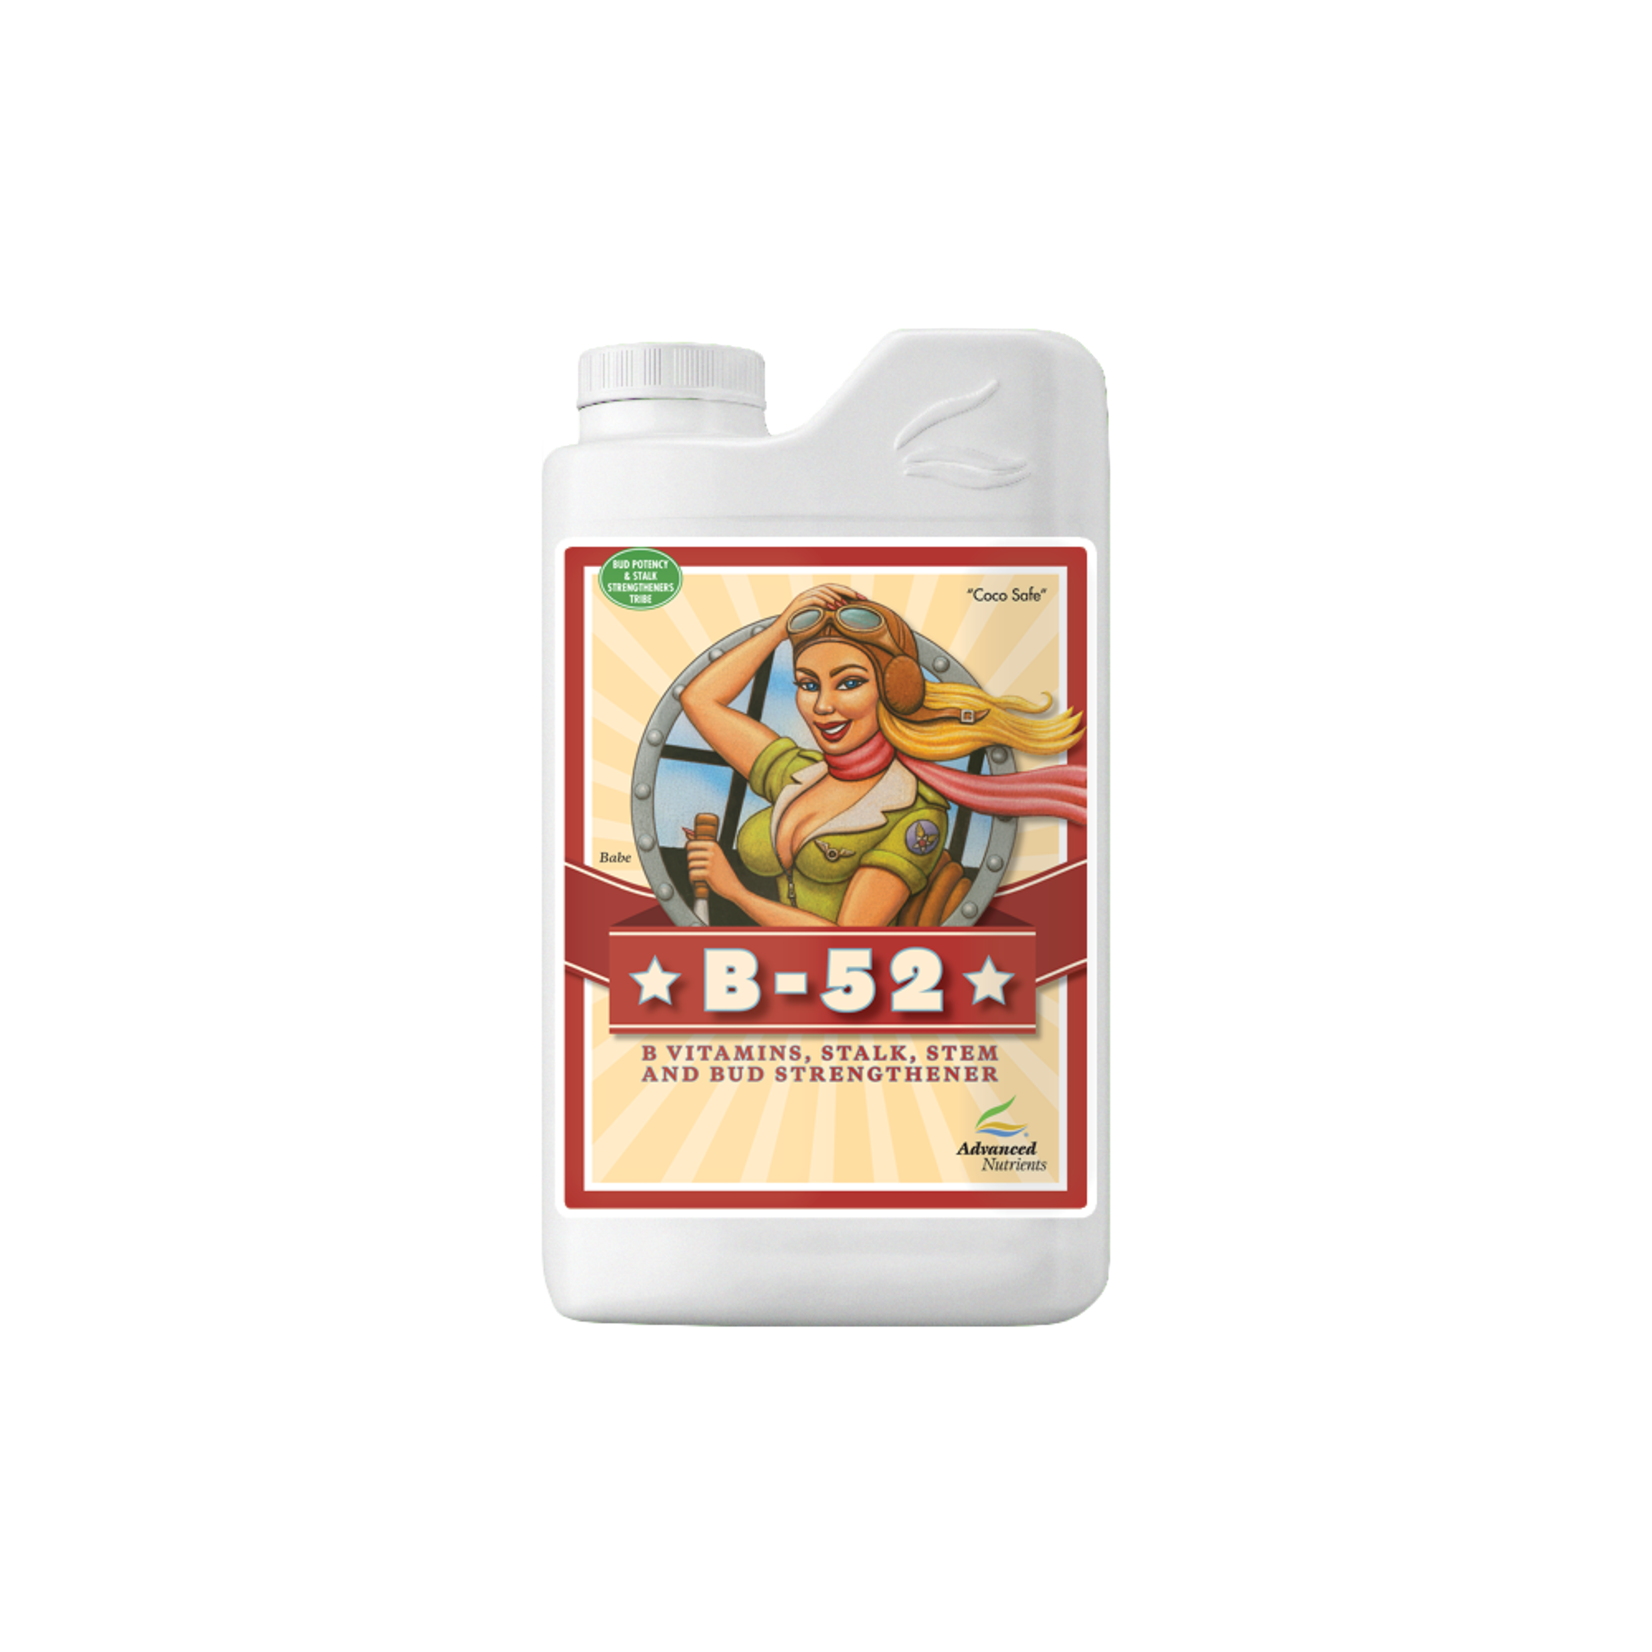 Advanced Nutrients ADVANCED NUTRIENTS B-52